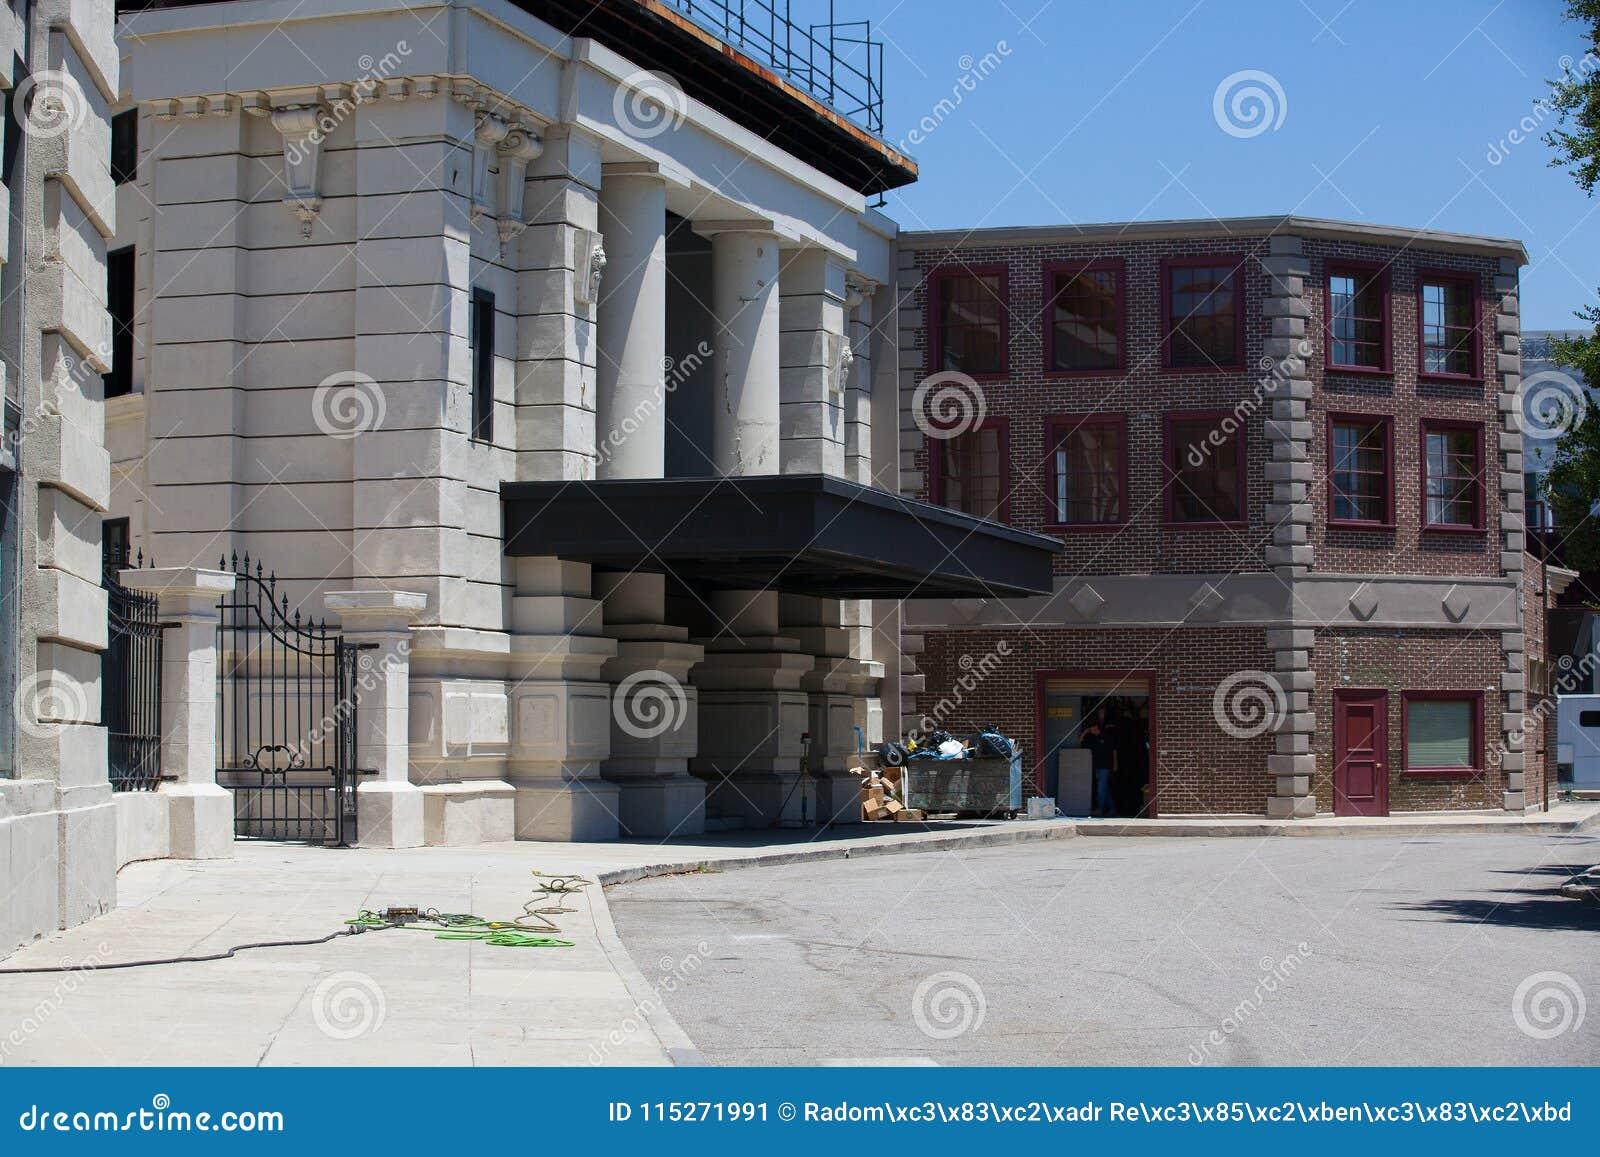 Warner Brothers Studios In Burbank,Los Angeles, USA